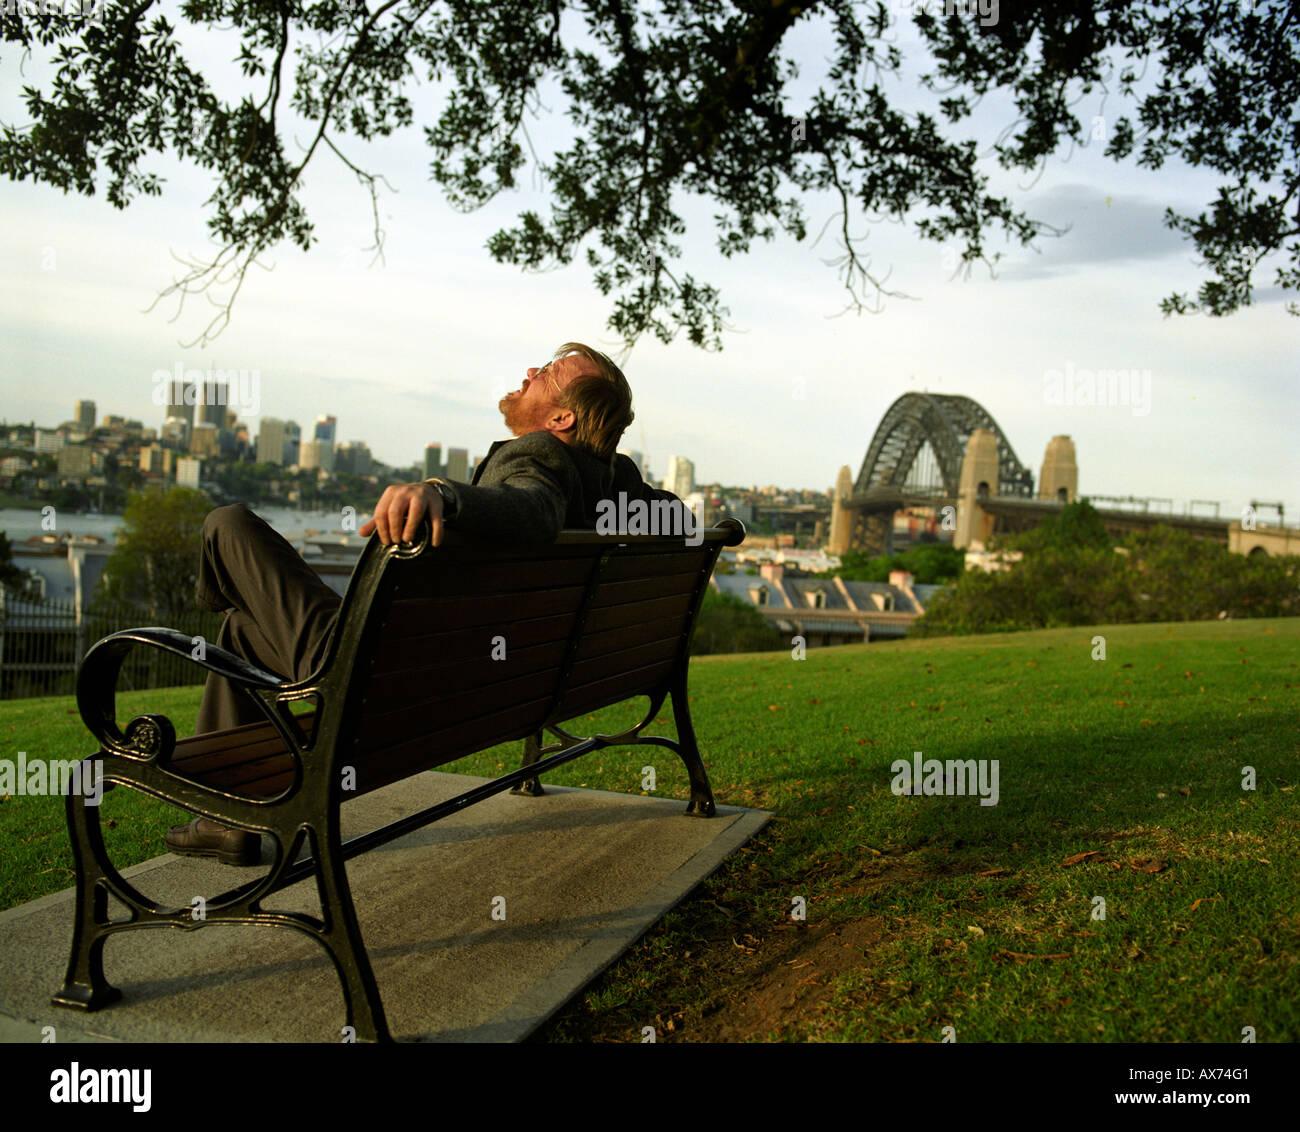 Author Bill Bryson in Sydney. - Stock Image